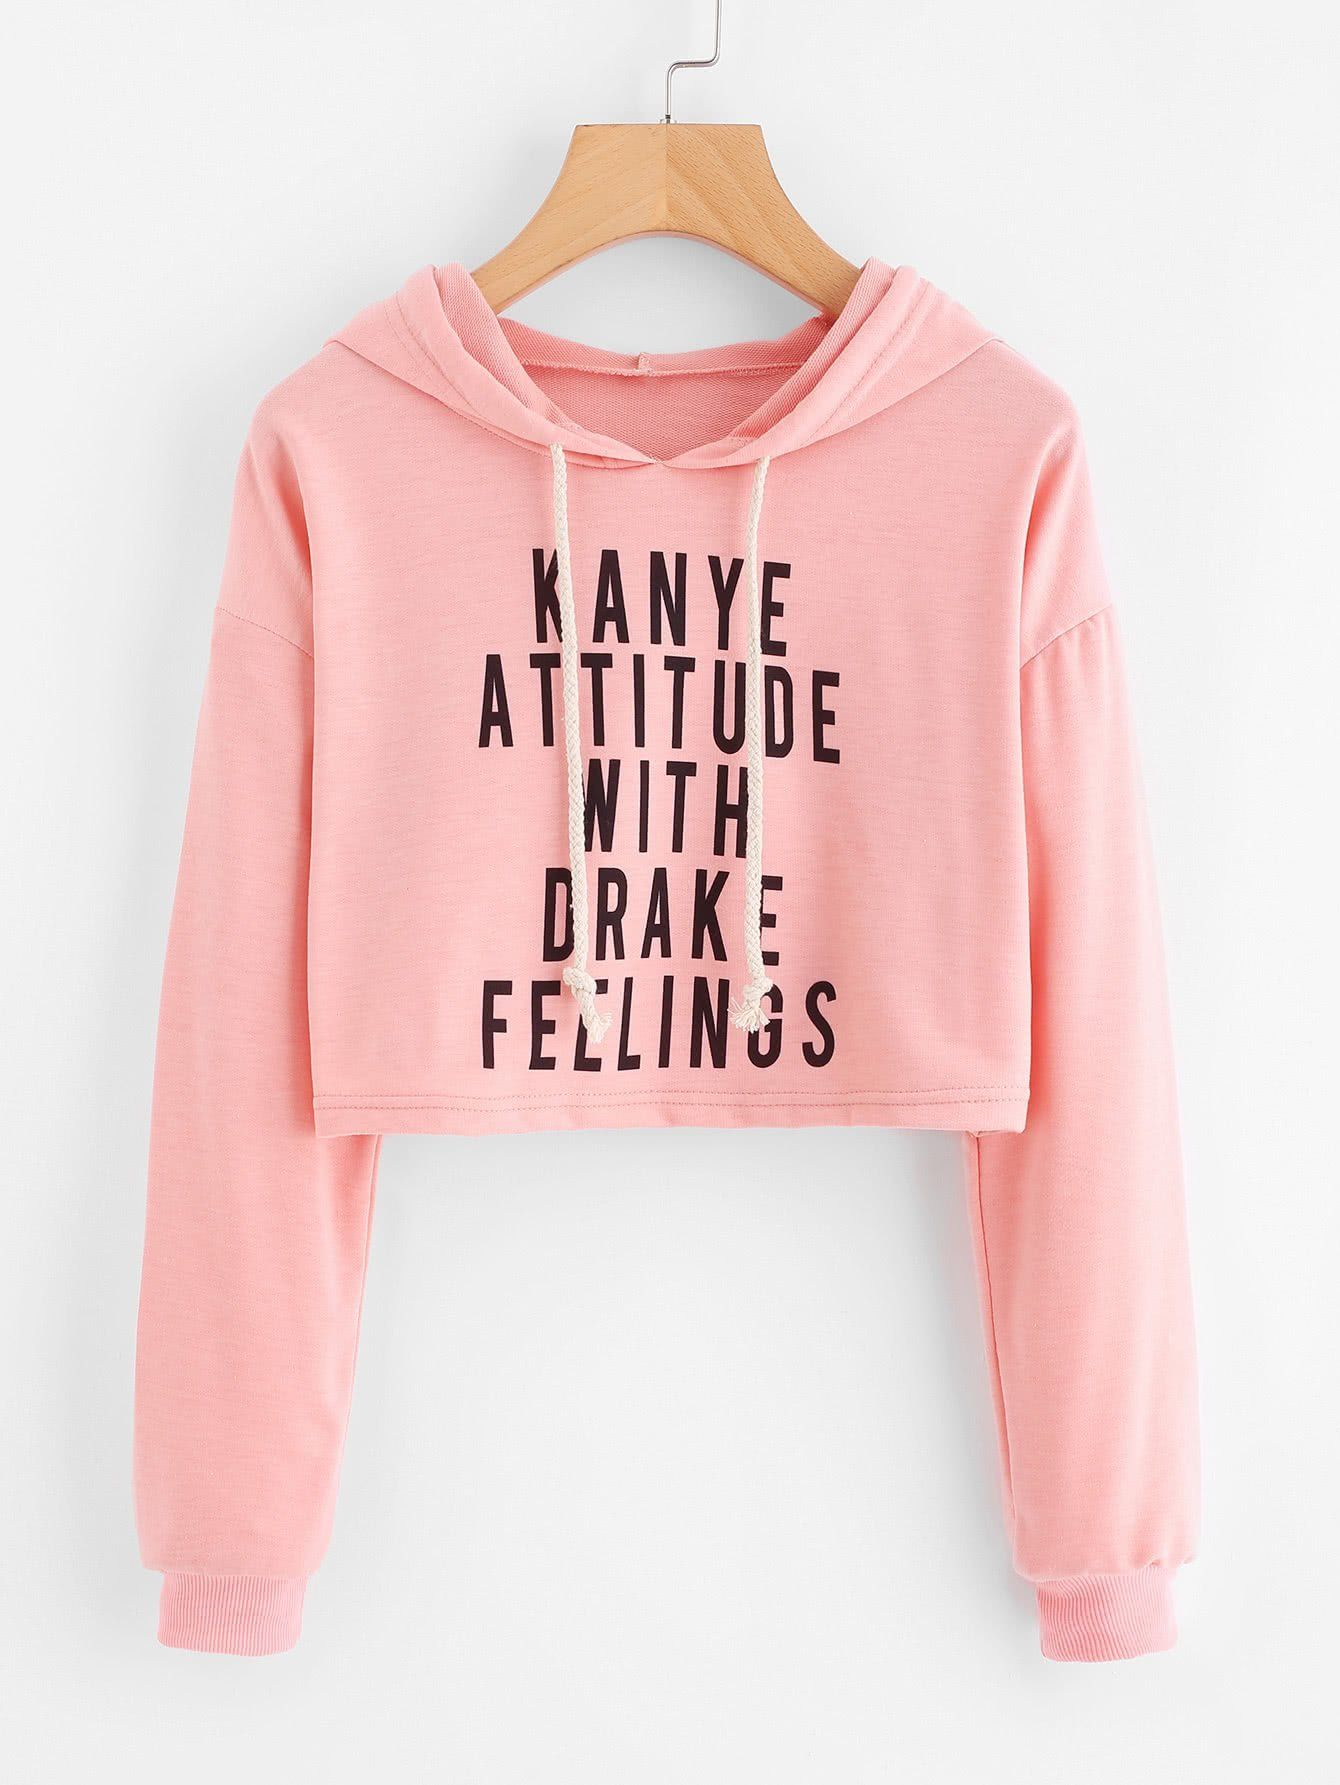 19fba90f043fc Kanye attitude drake feeling crop sweatshirt in 2019